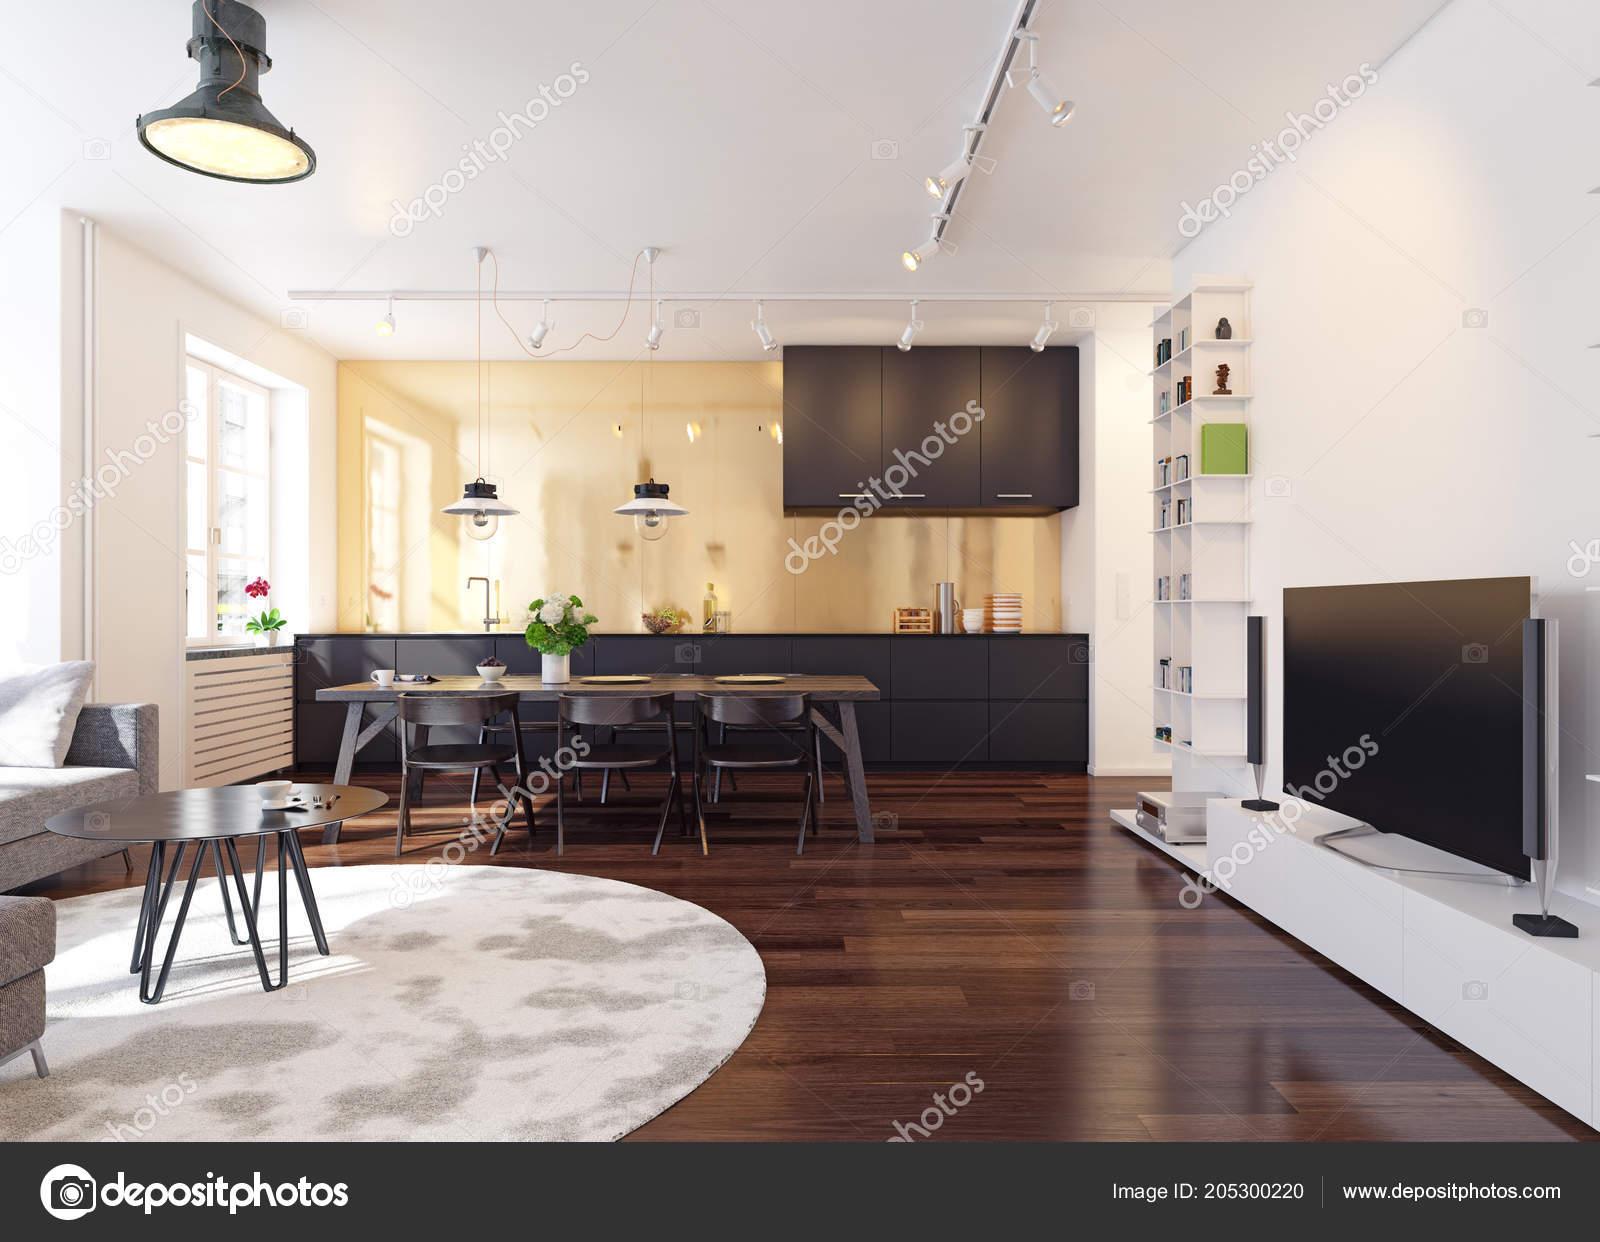 Cuisine Moderne Rendu 3d Intérieur. Concept De Design Contemporain U2014 Image  De ...